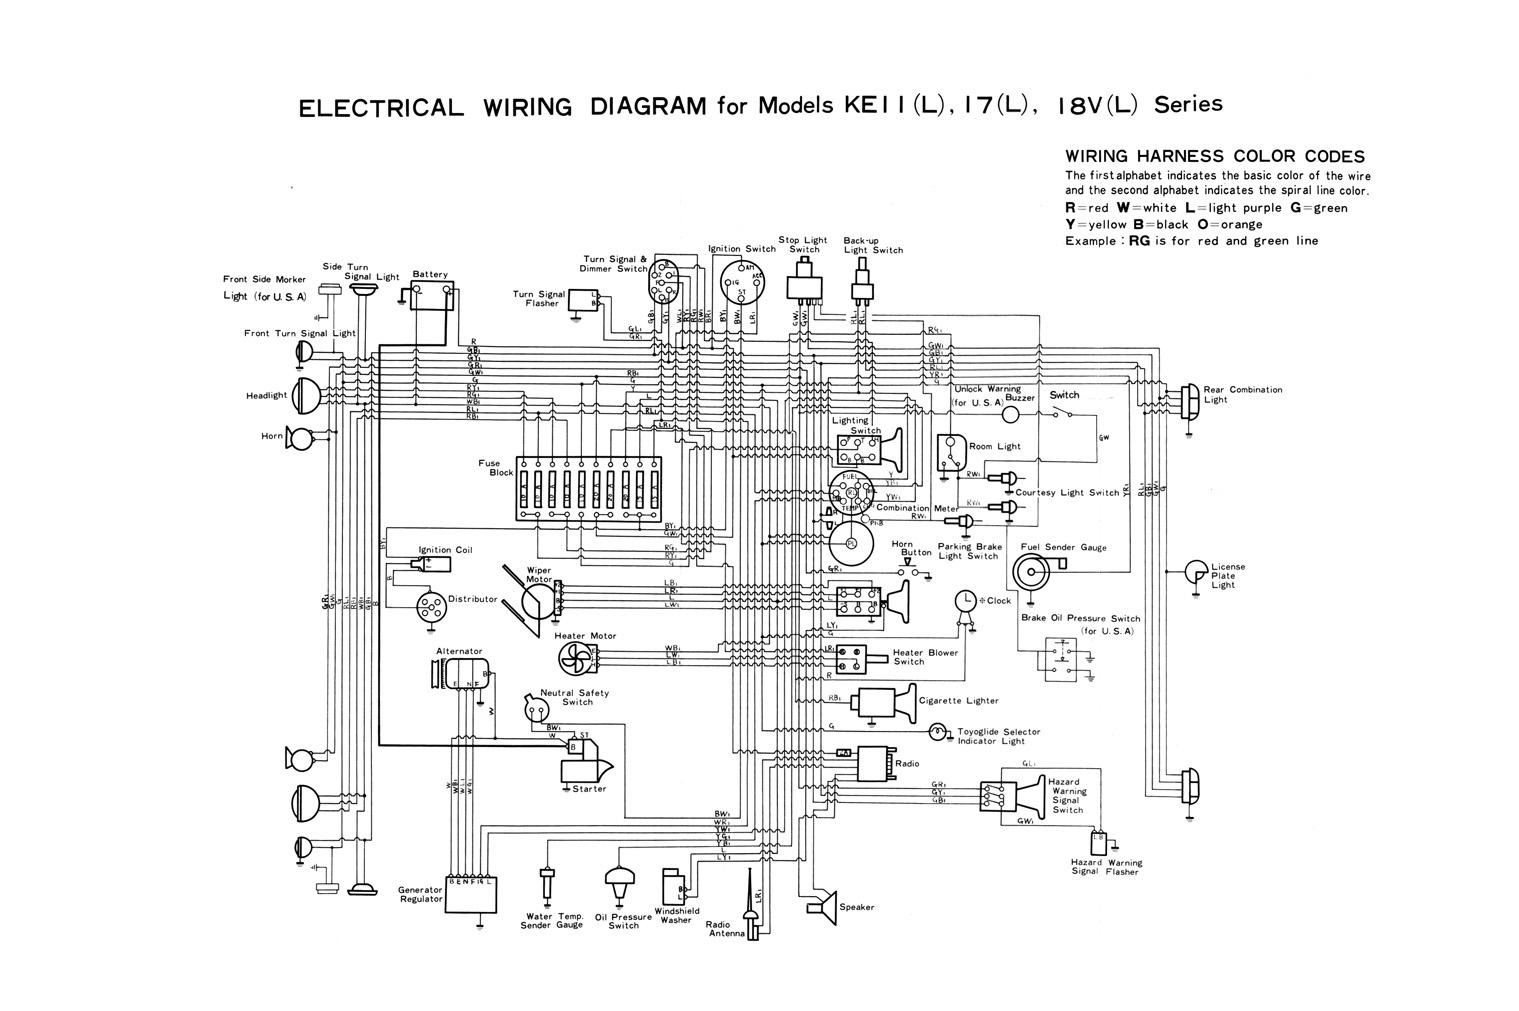 Toyota Corolla Service Manual - Body - 1969